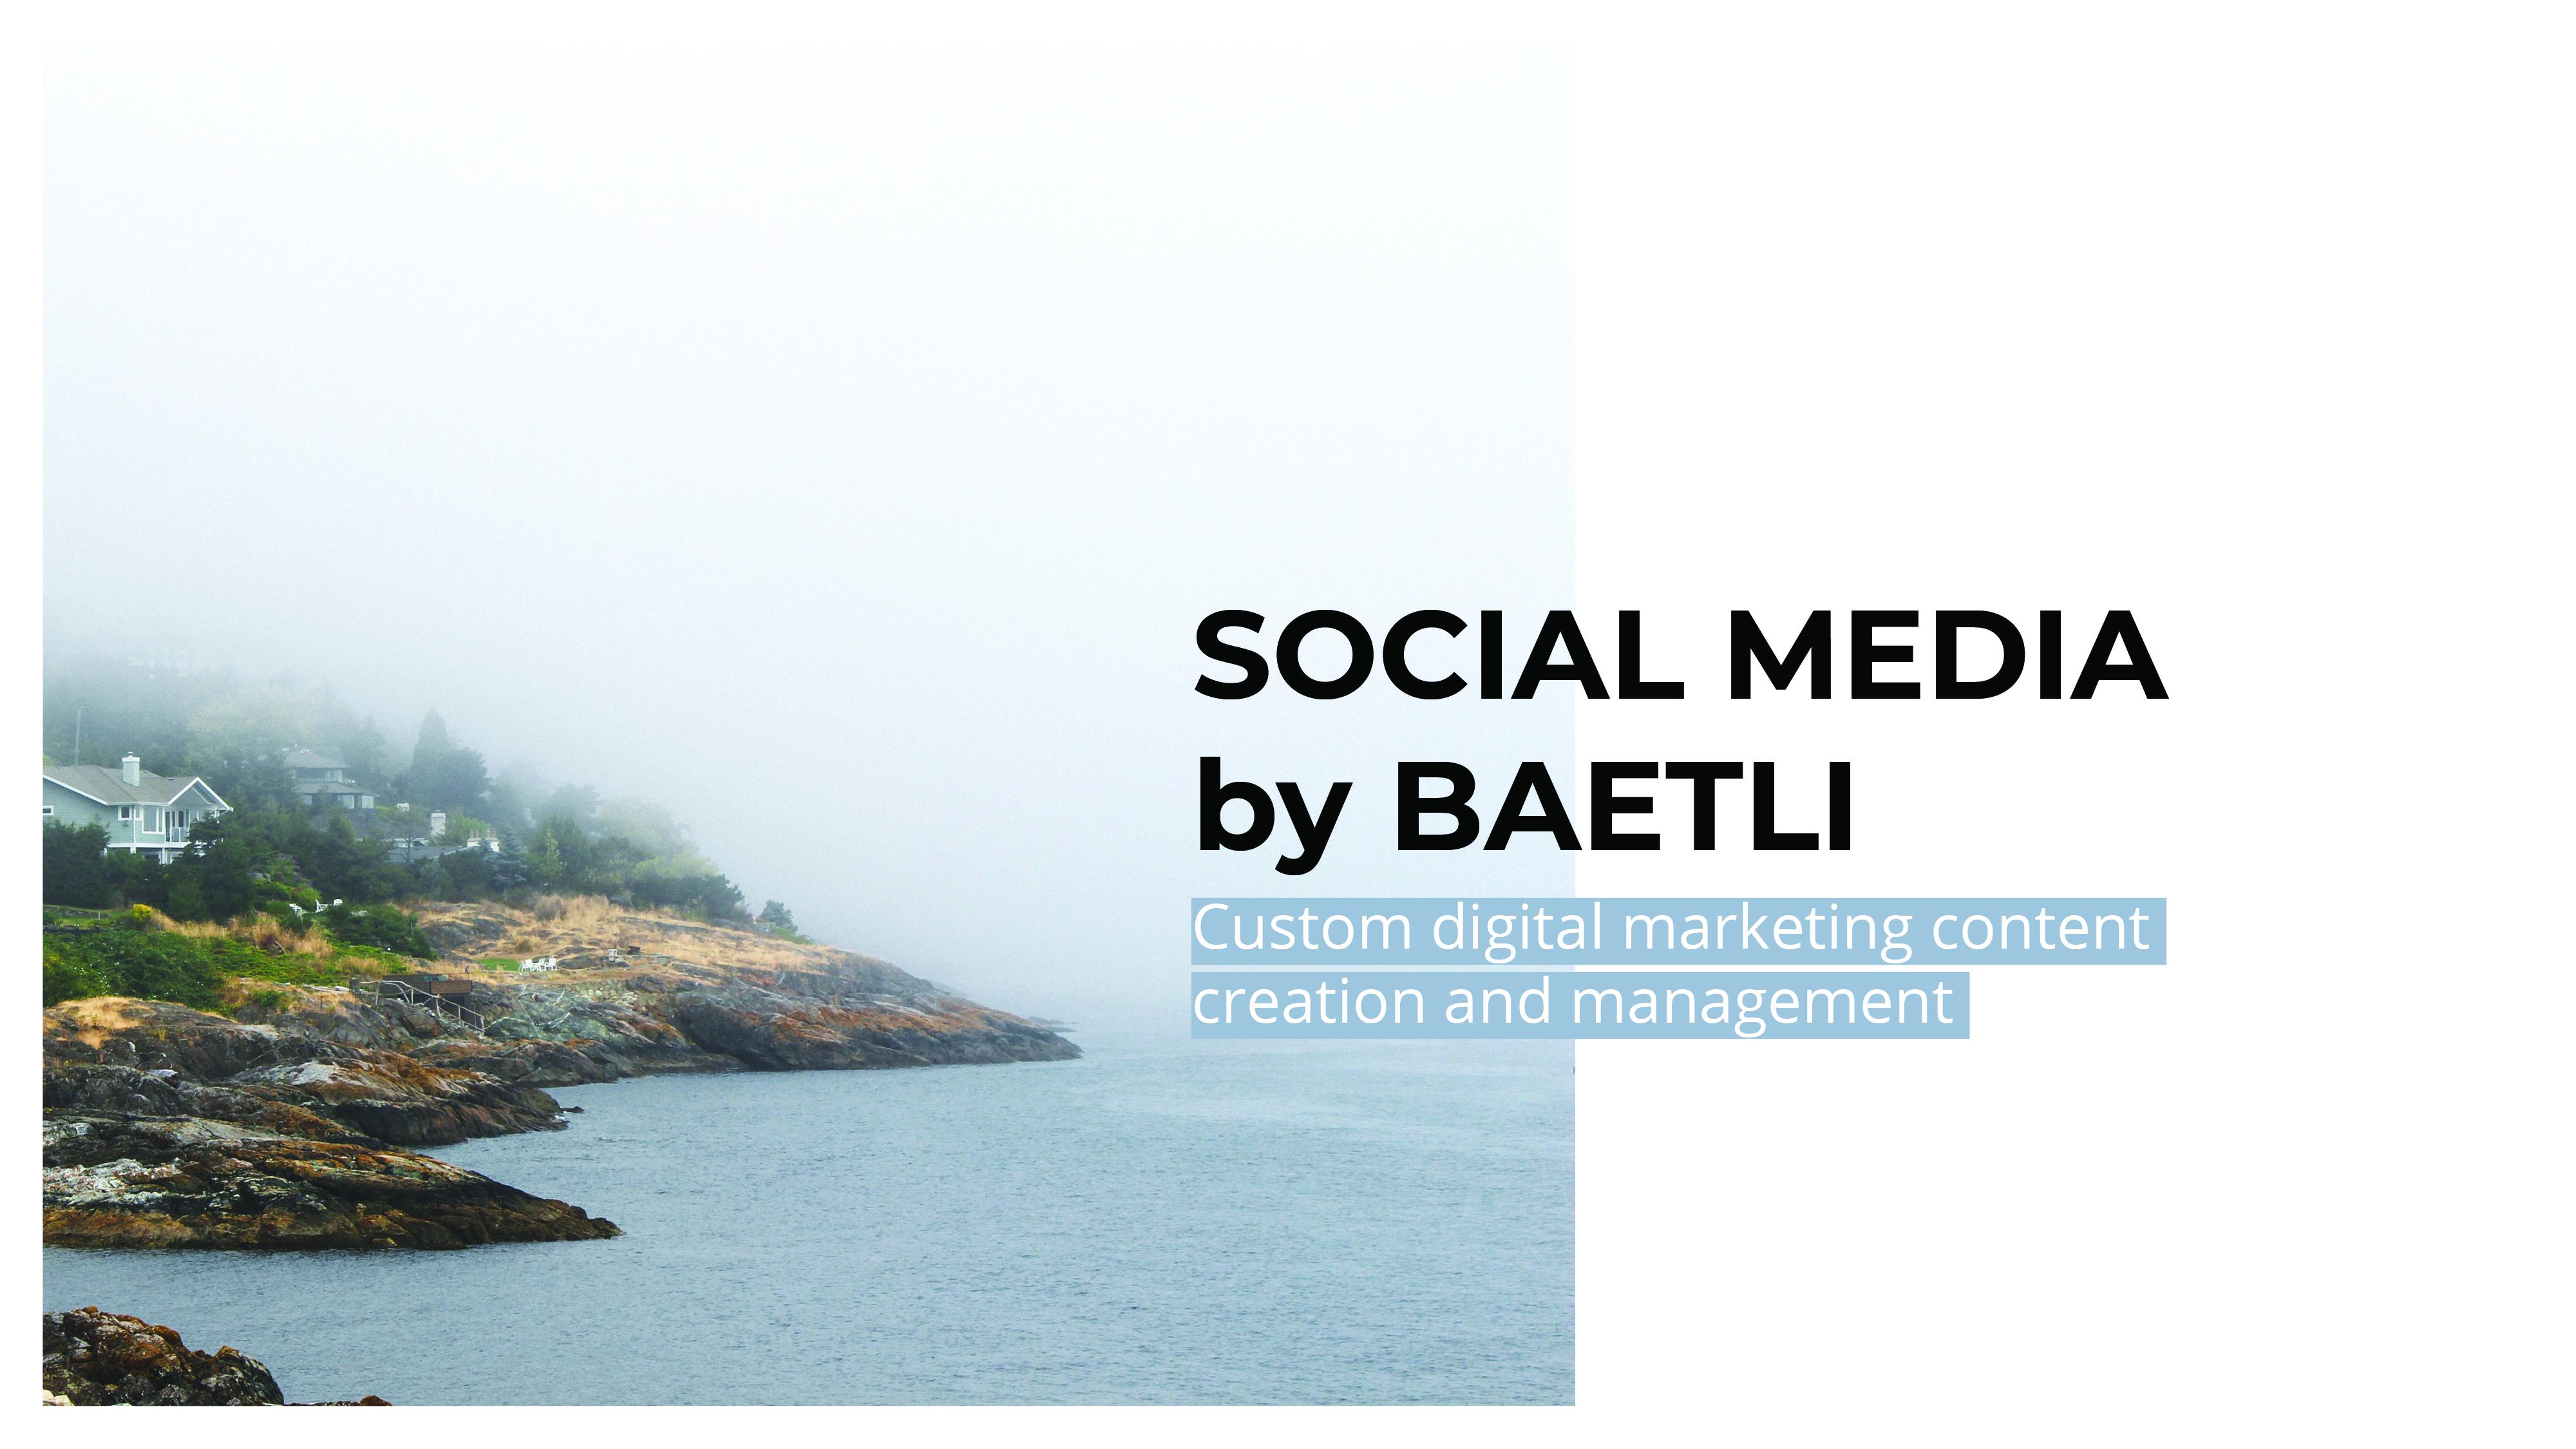 Social Media by BAETLI